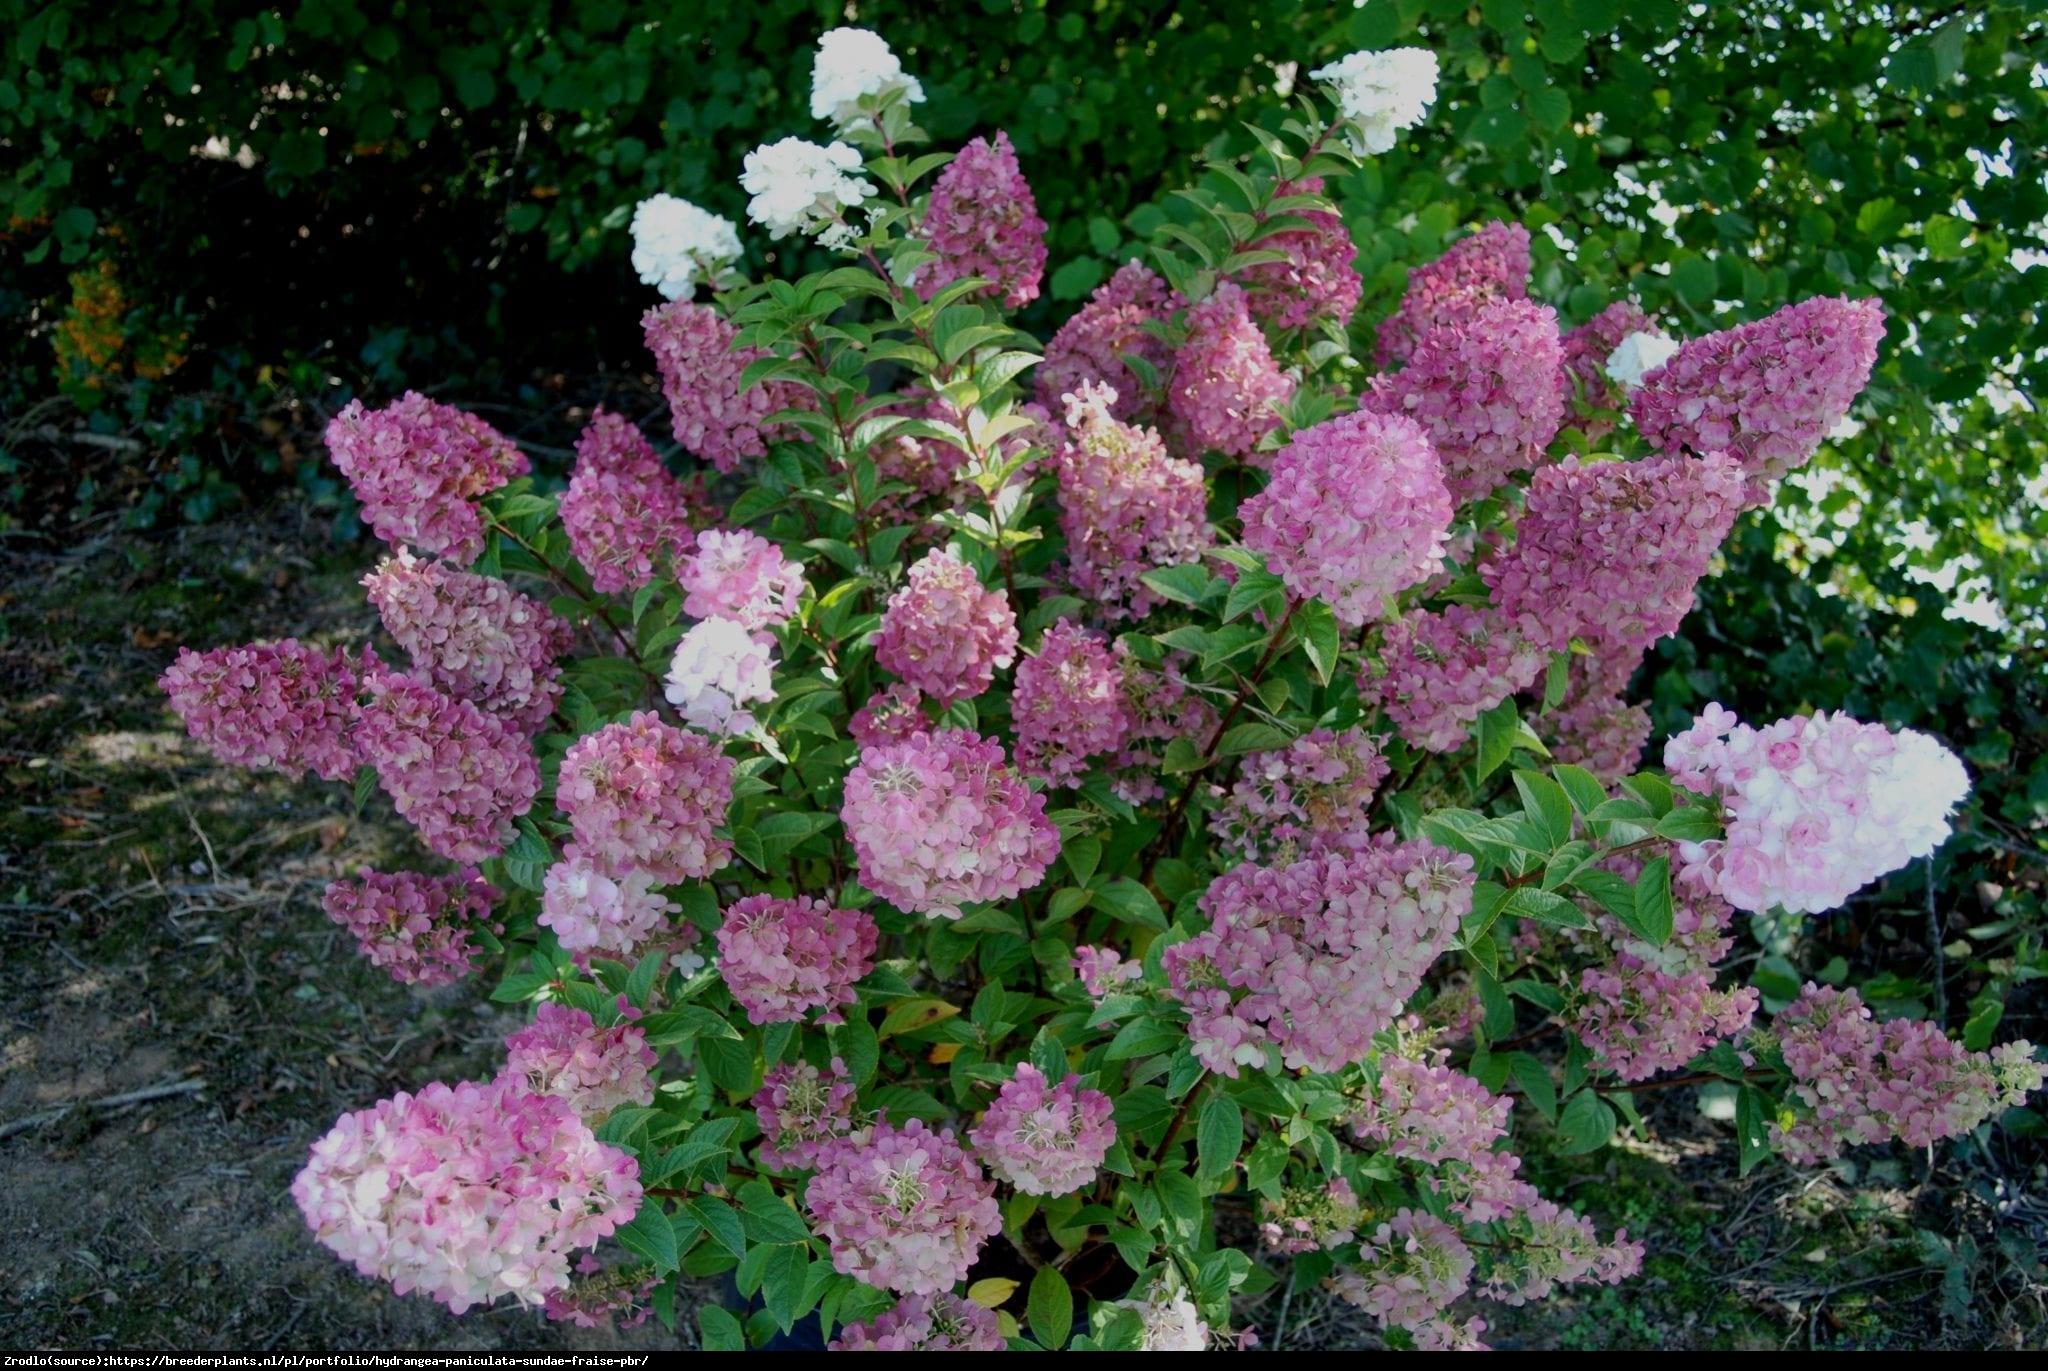 Hortensja bukietowa SUNDAE FRAISE- miniaturowa księżniczka - Hydrangea paniculata Sunday Fraise